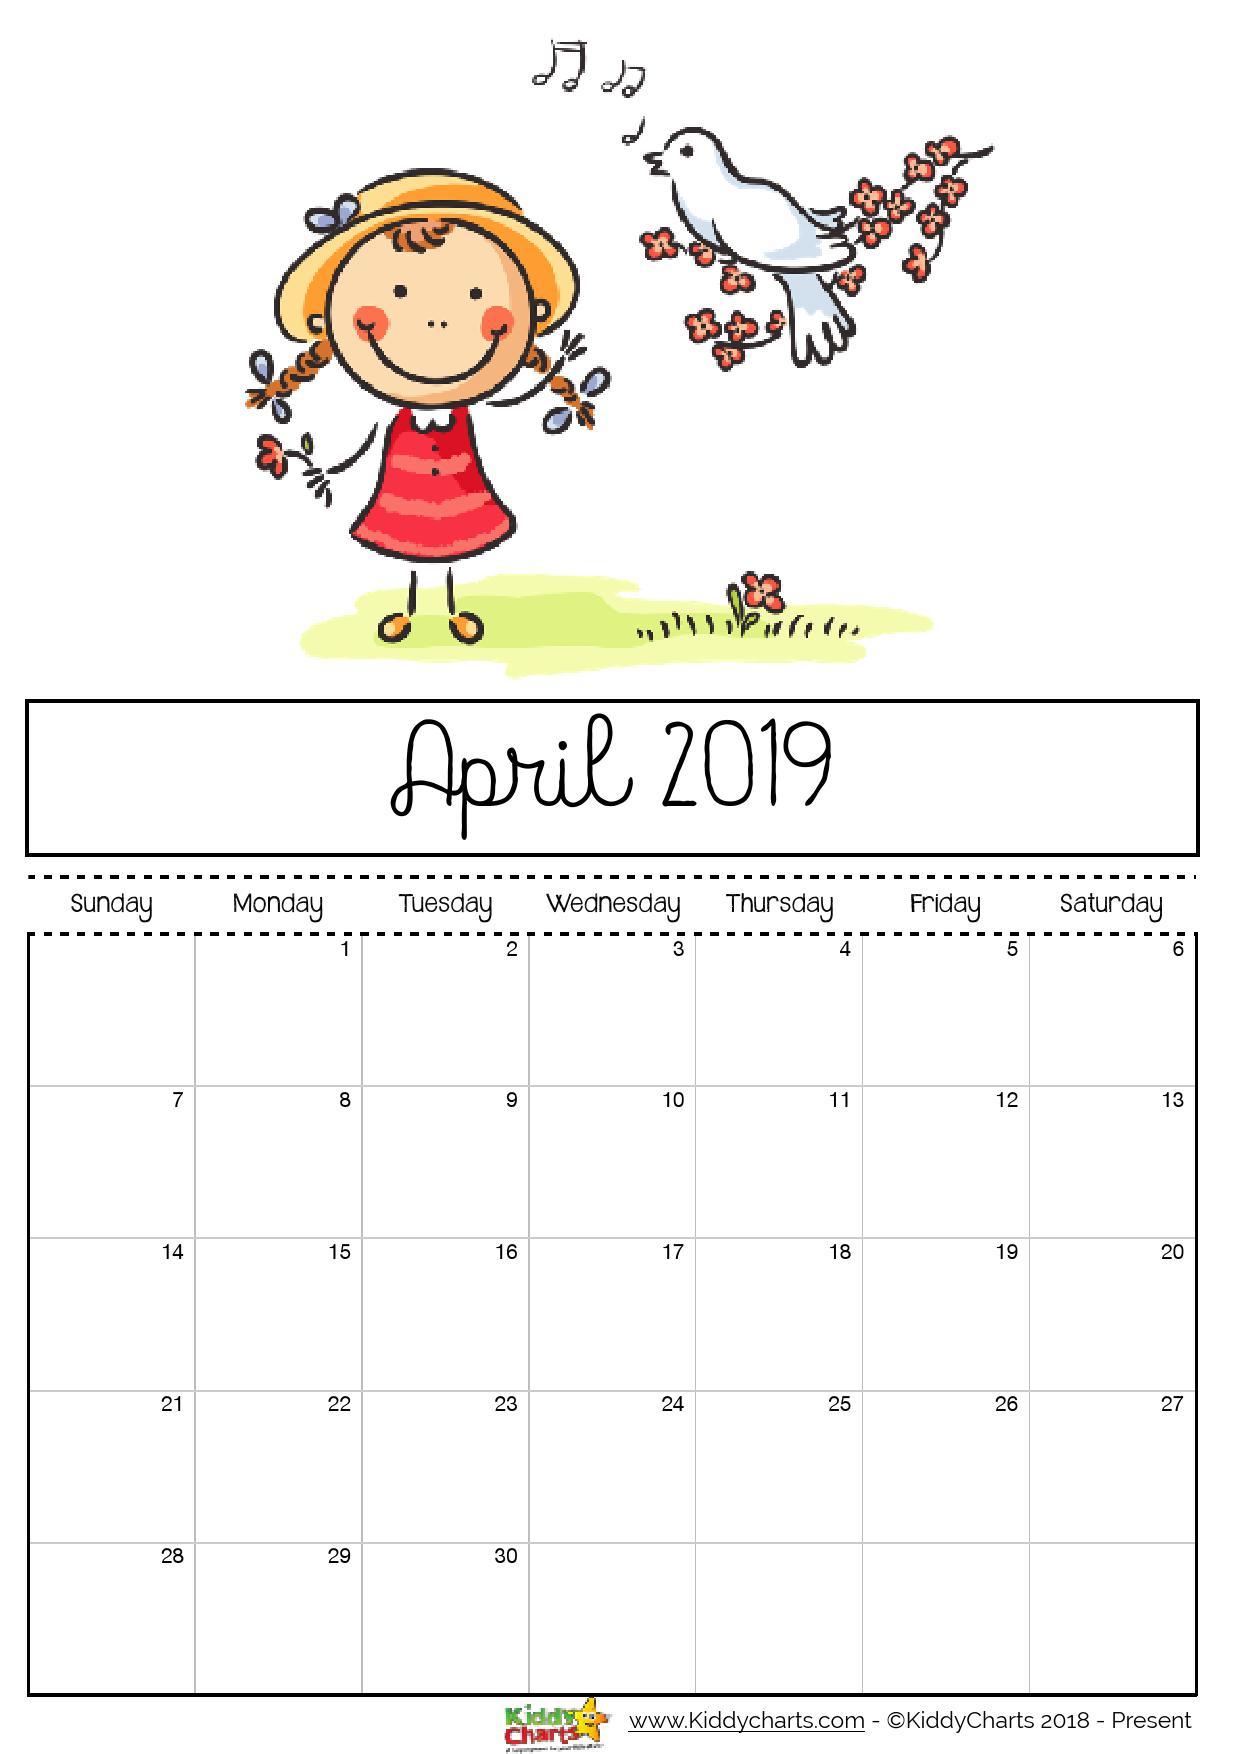 April Reward Chart Printable